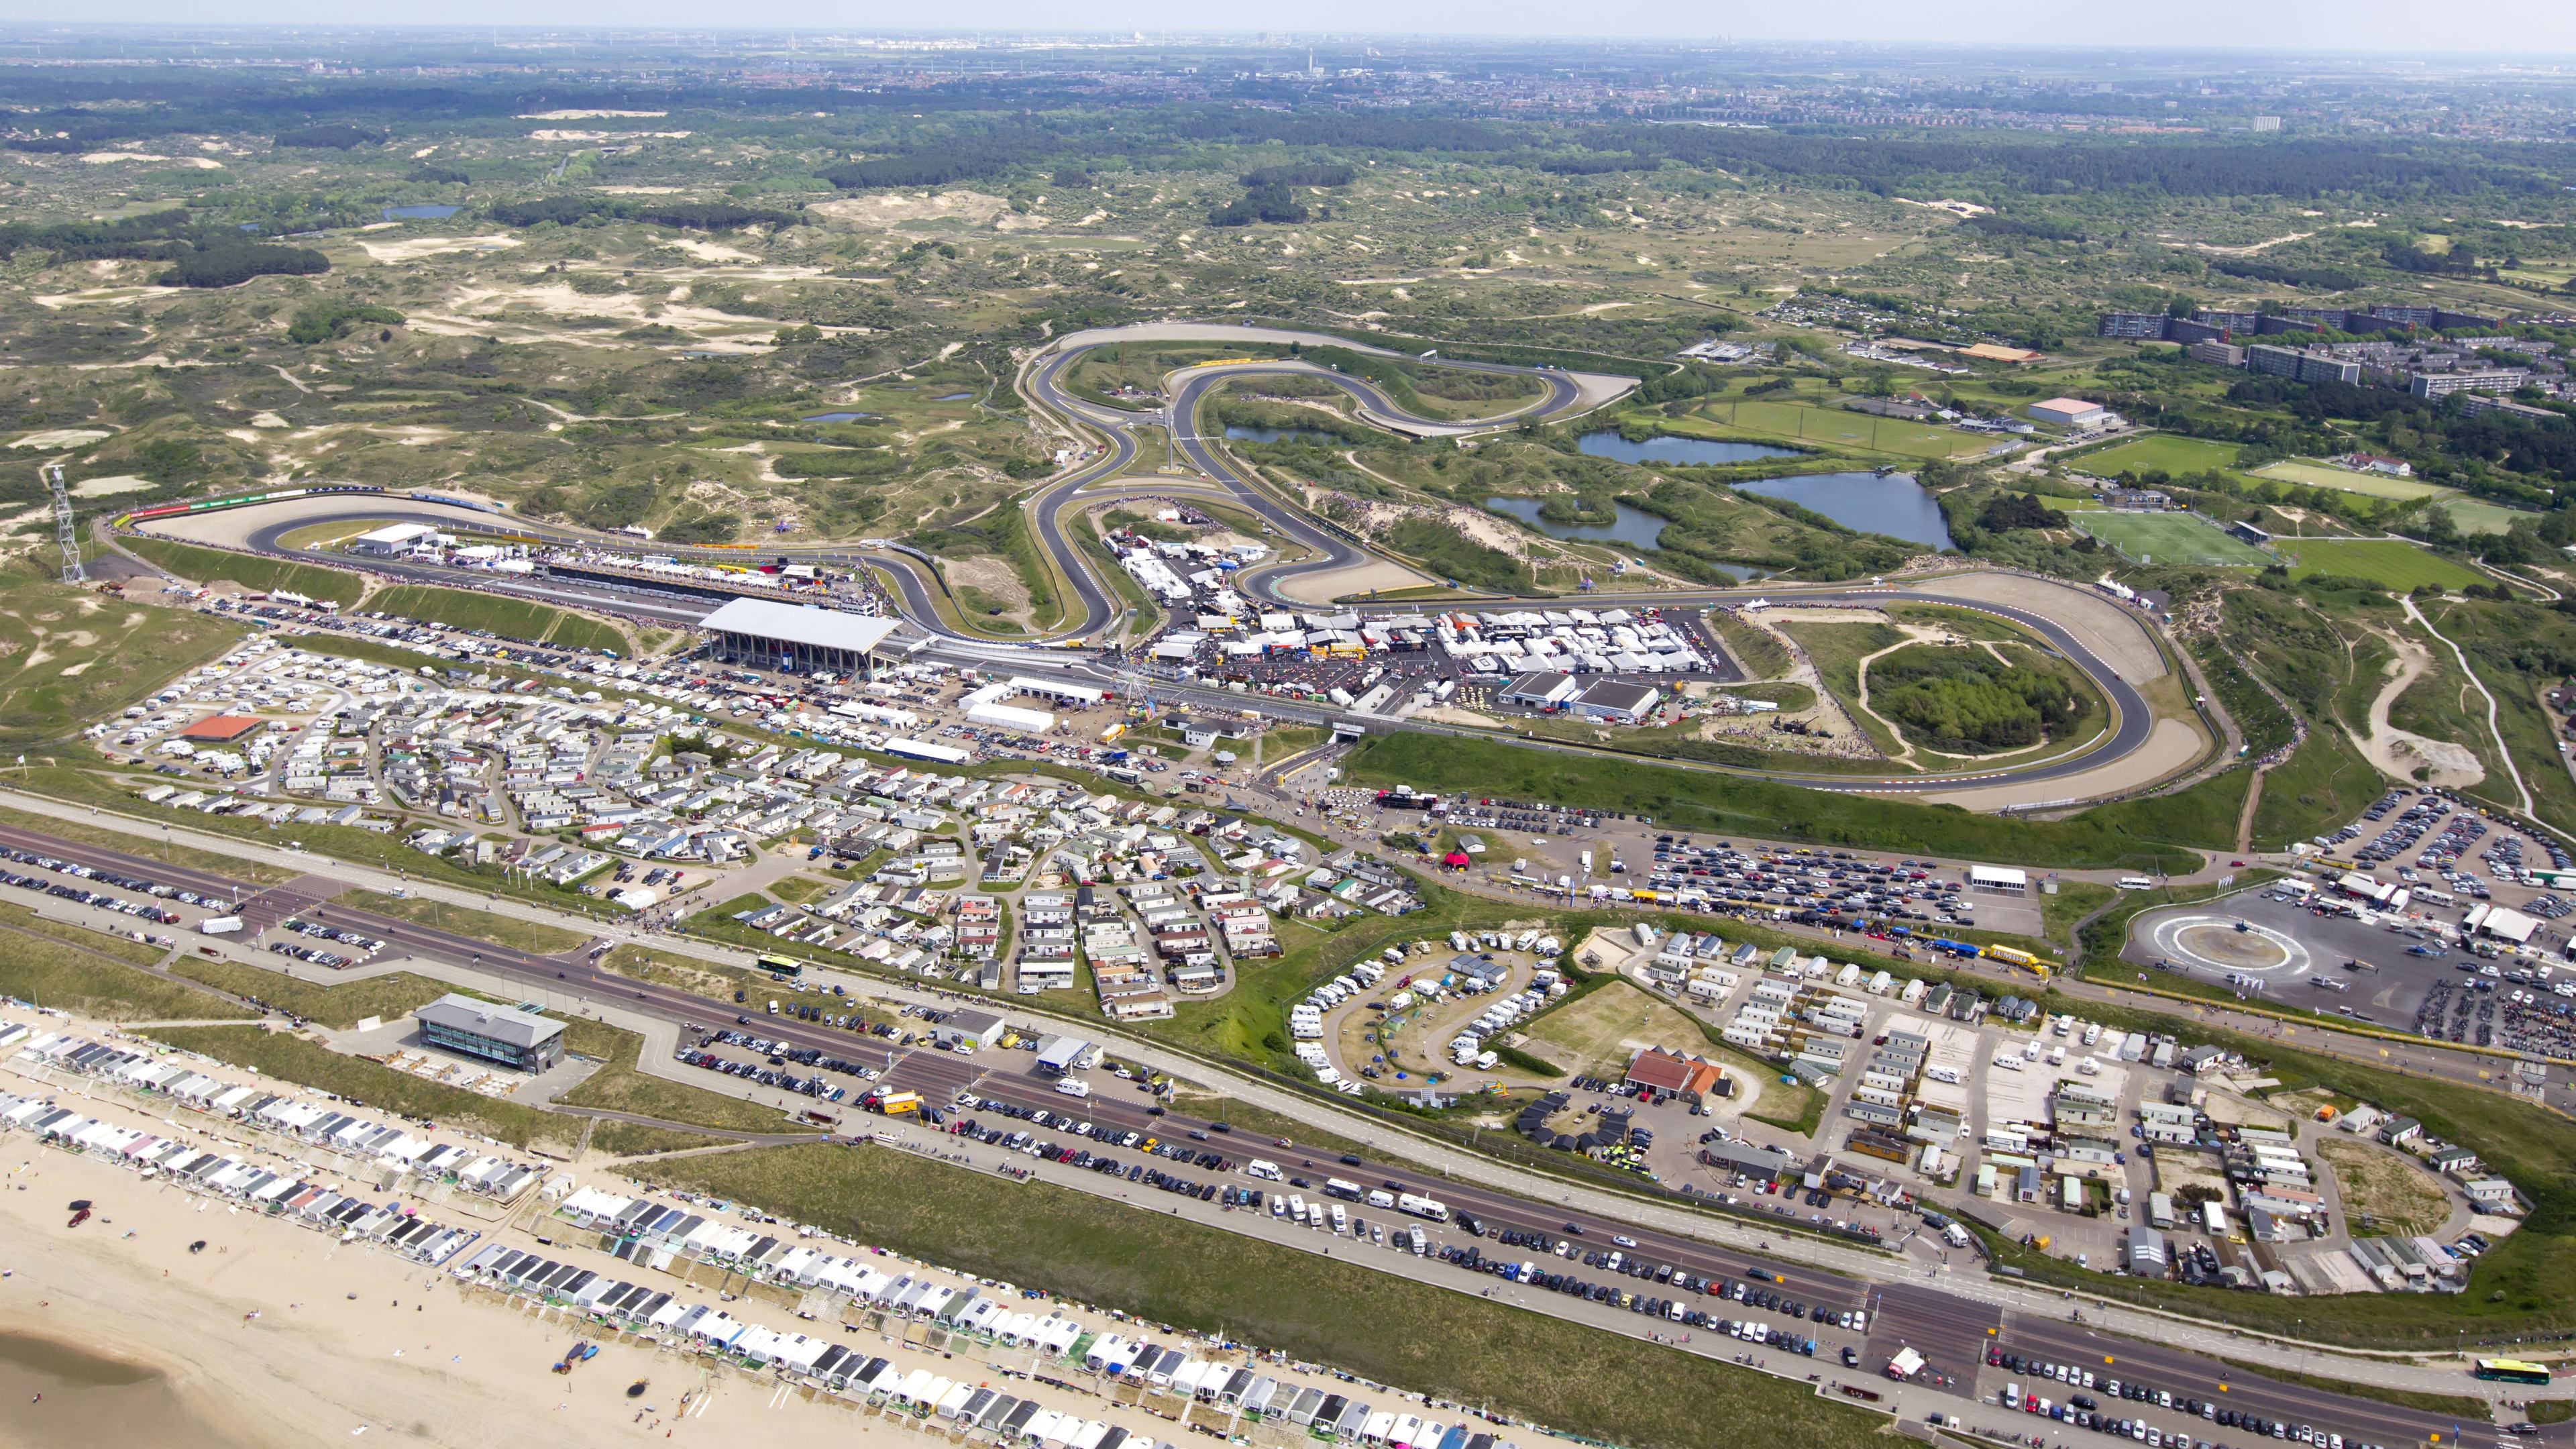 Formula 1 Dutch Grand Prix To Return At Zandvoort From 2020 Formula 1